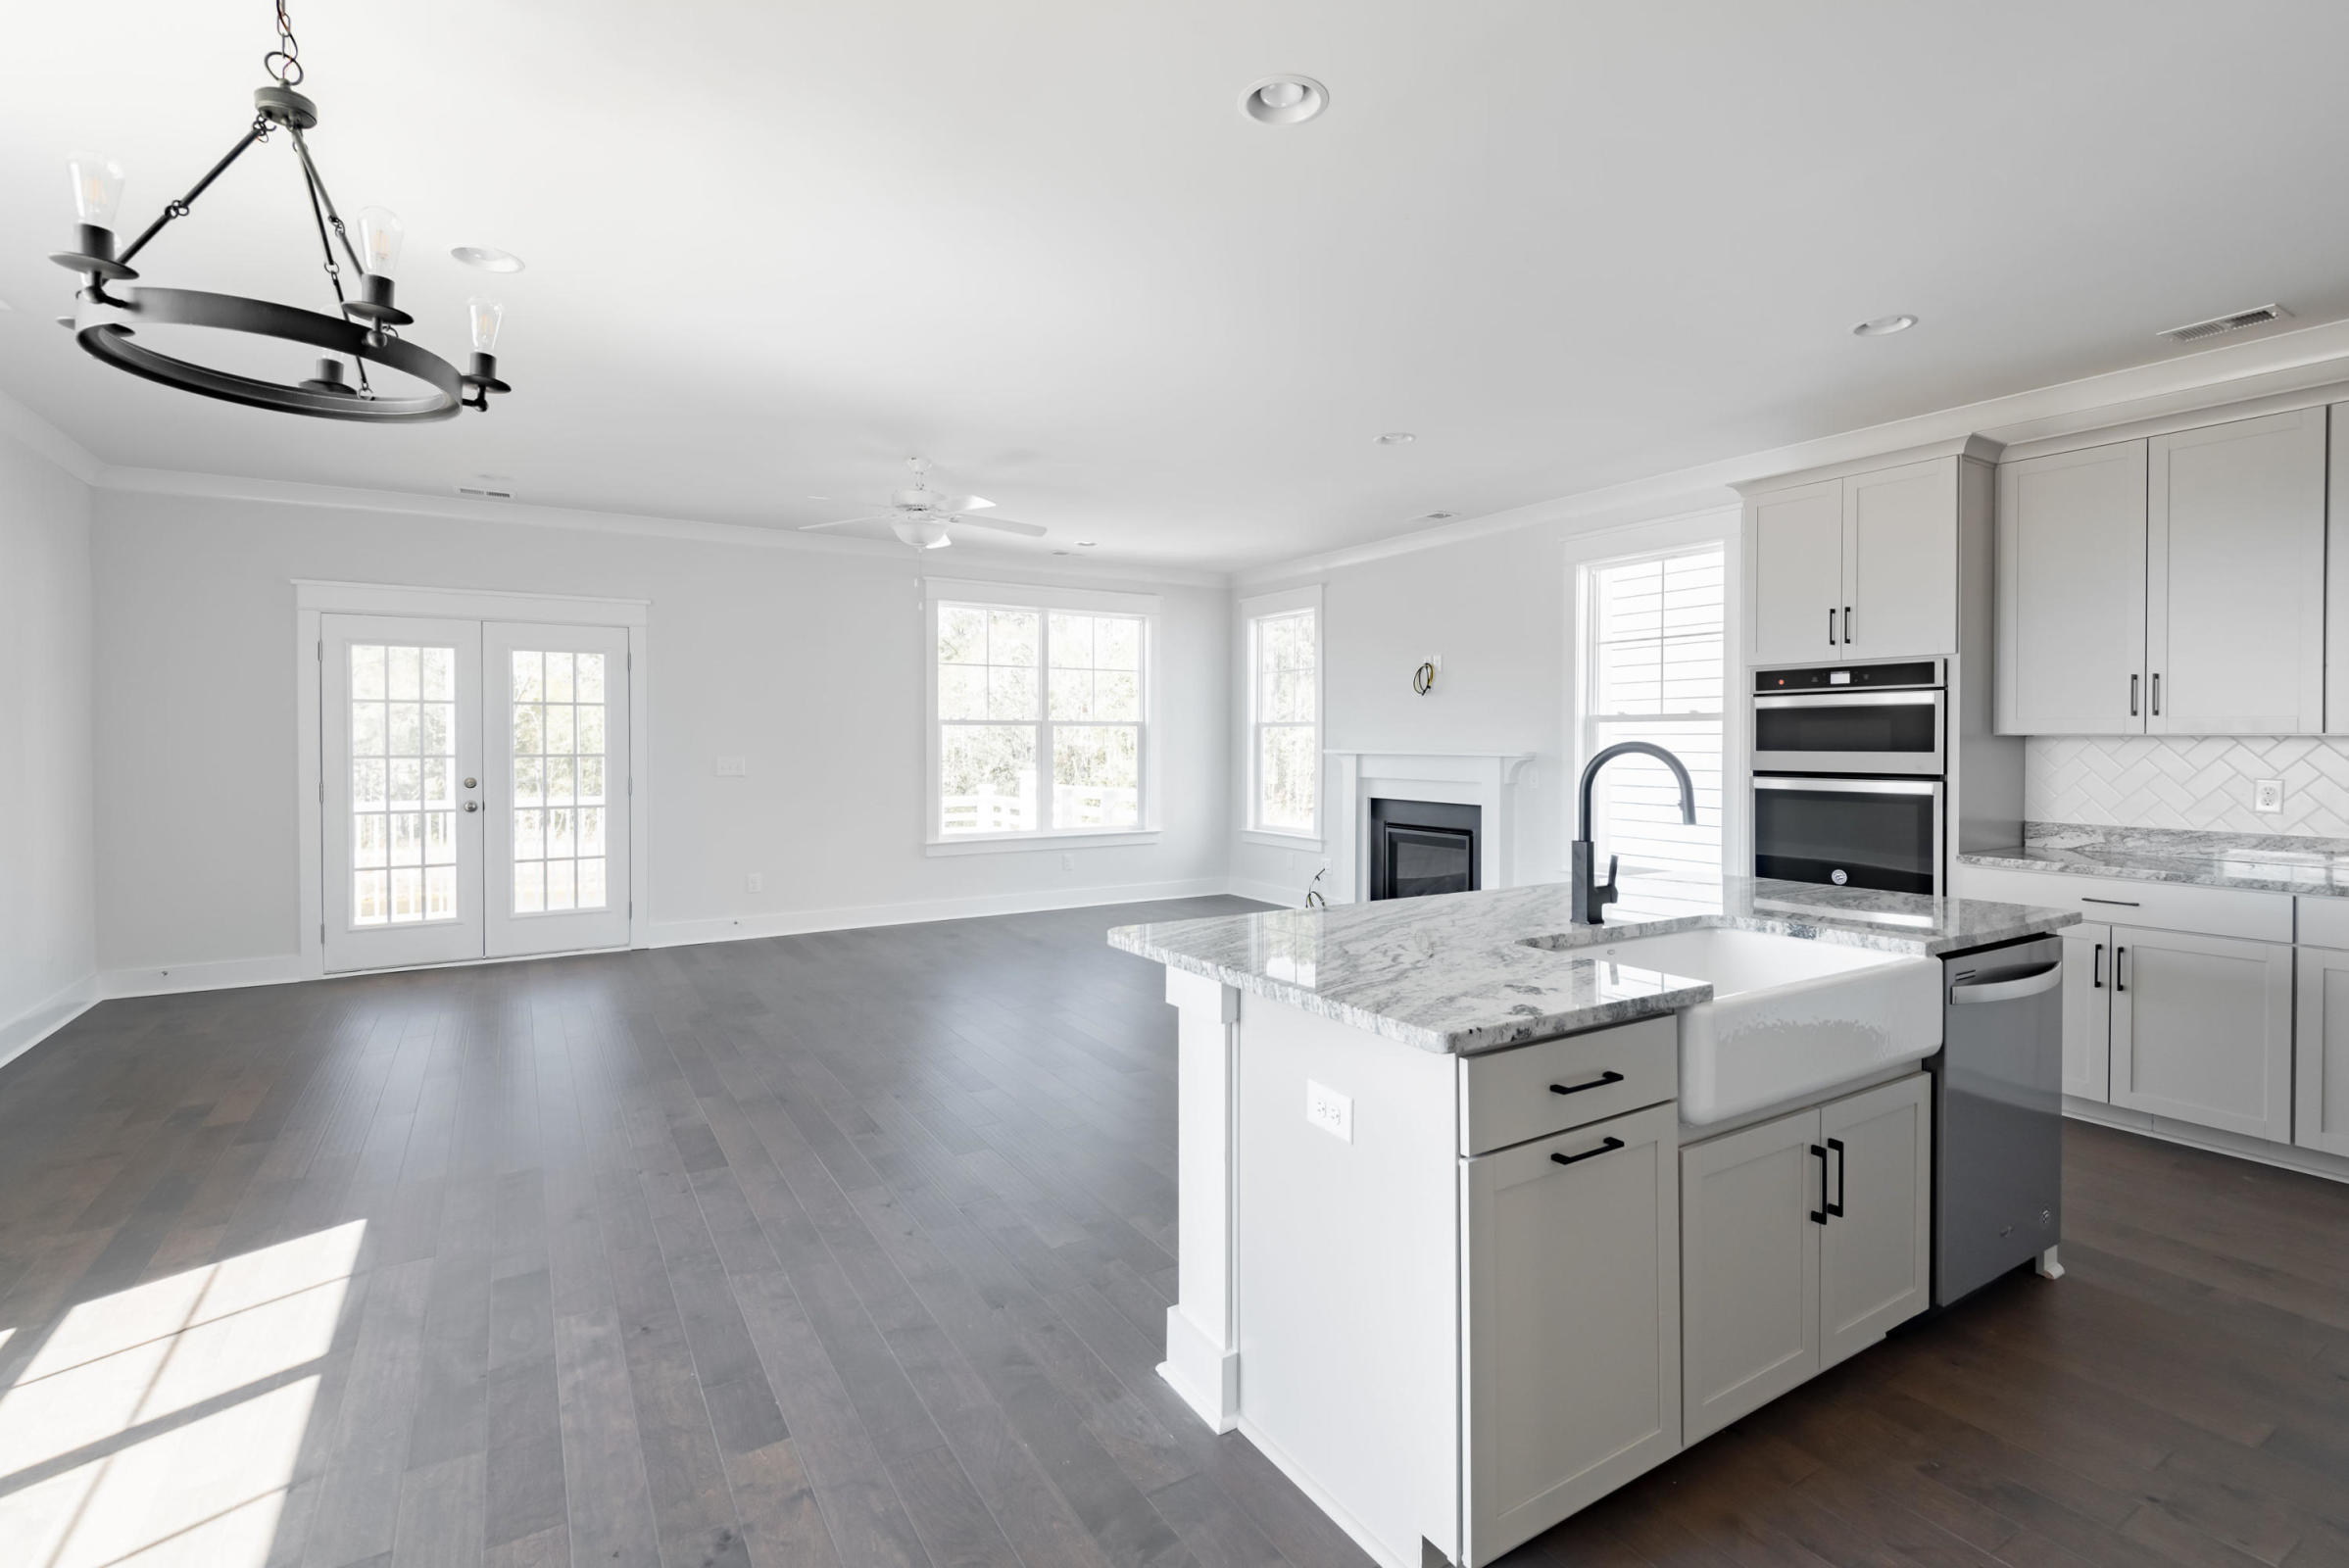 James Island Homes For Sale - 1397 Harbor View, Charleston, SC - 2